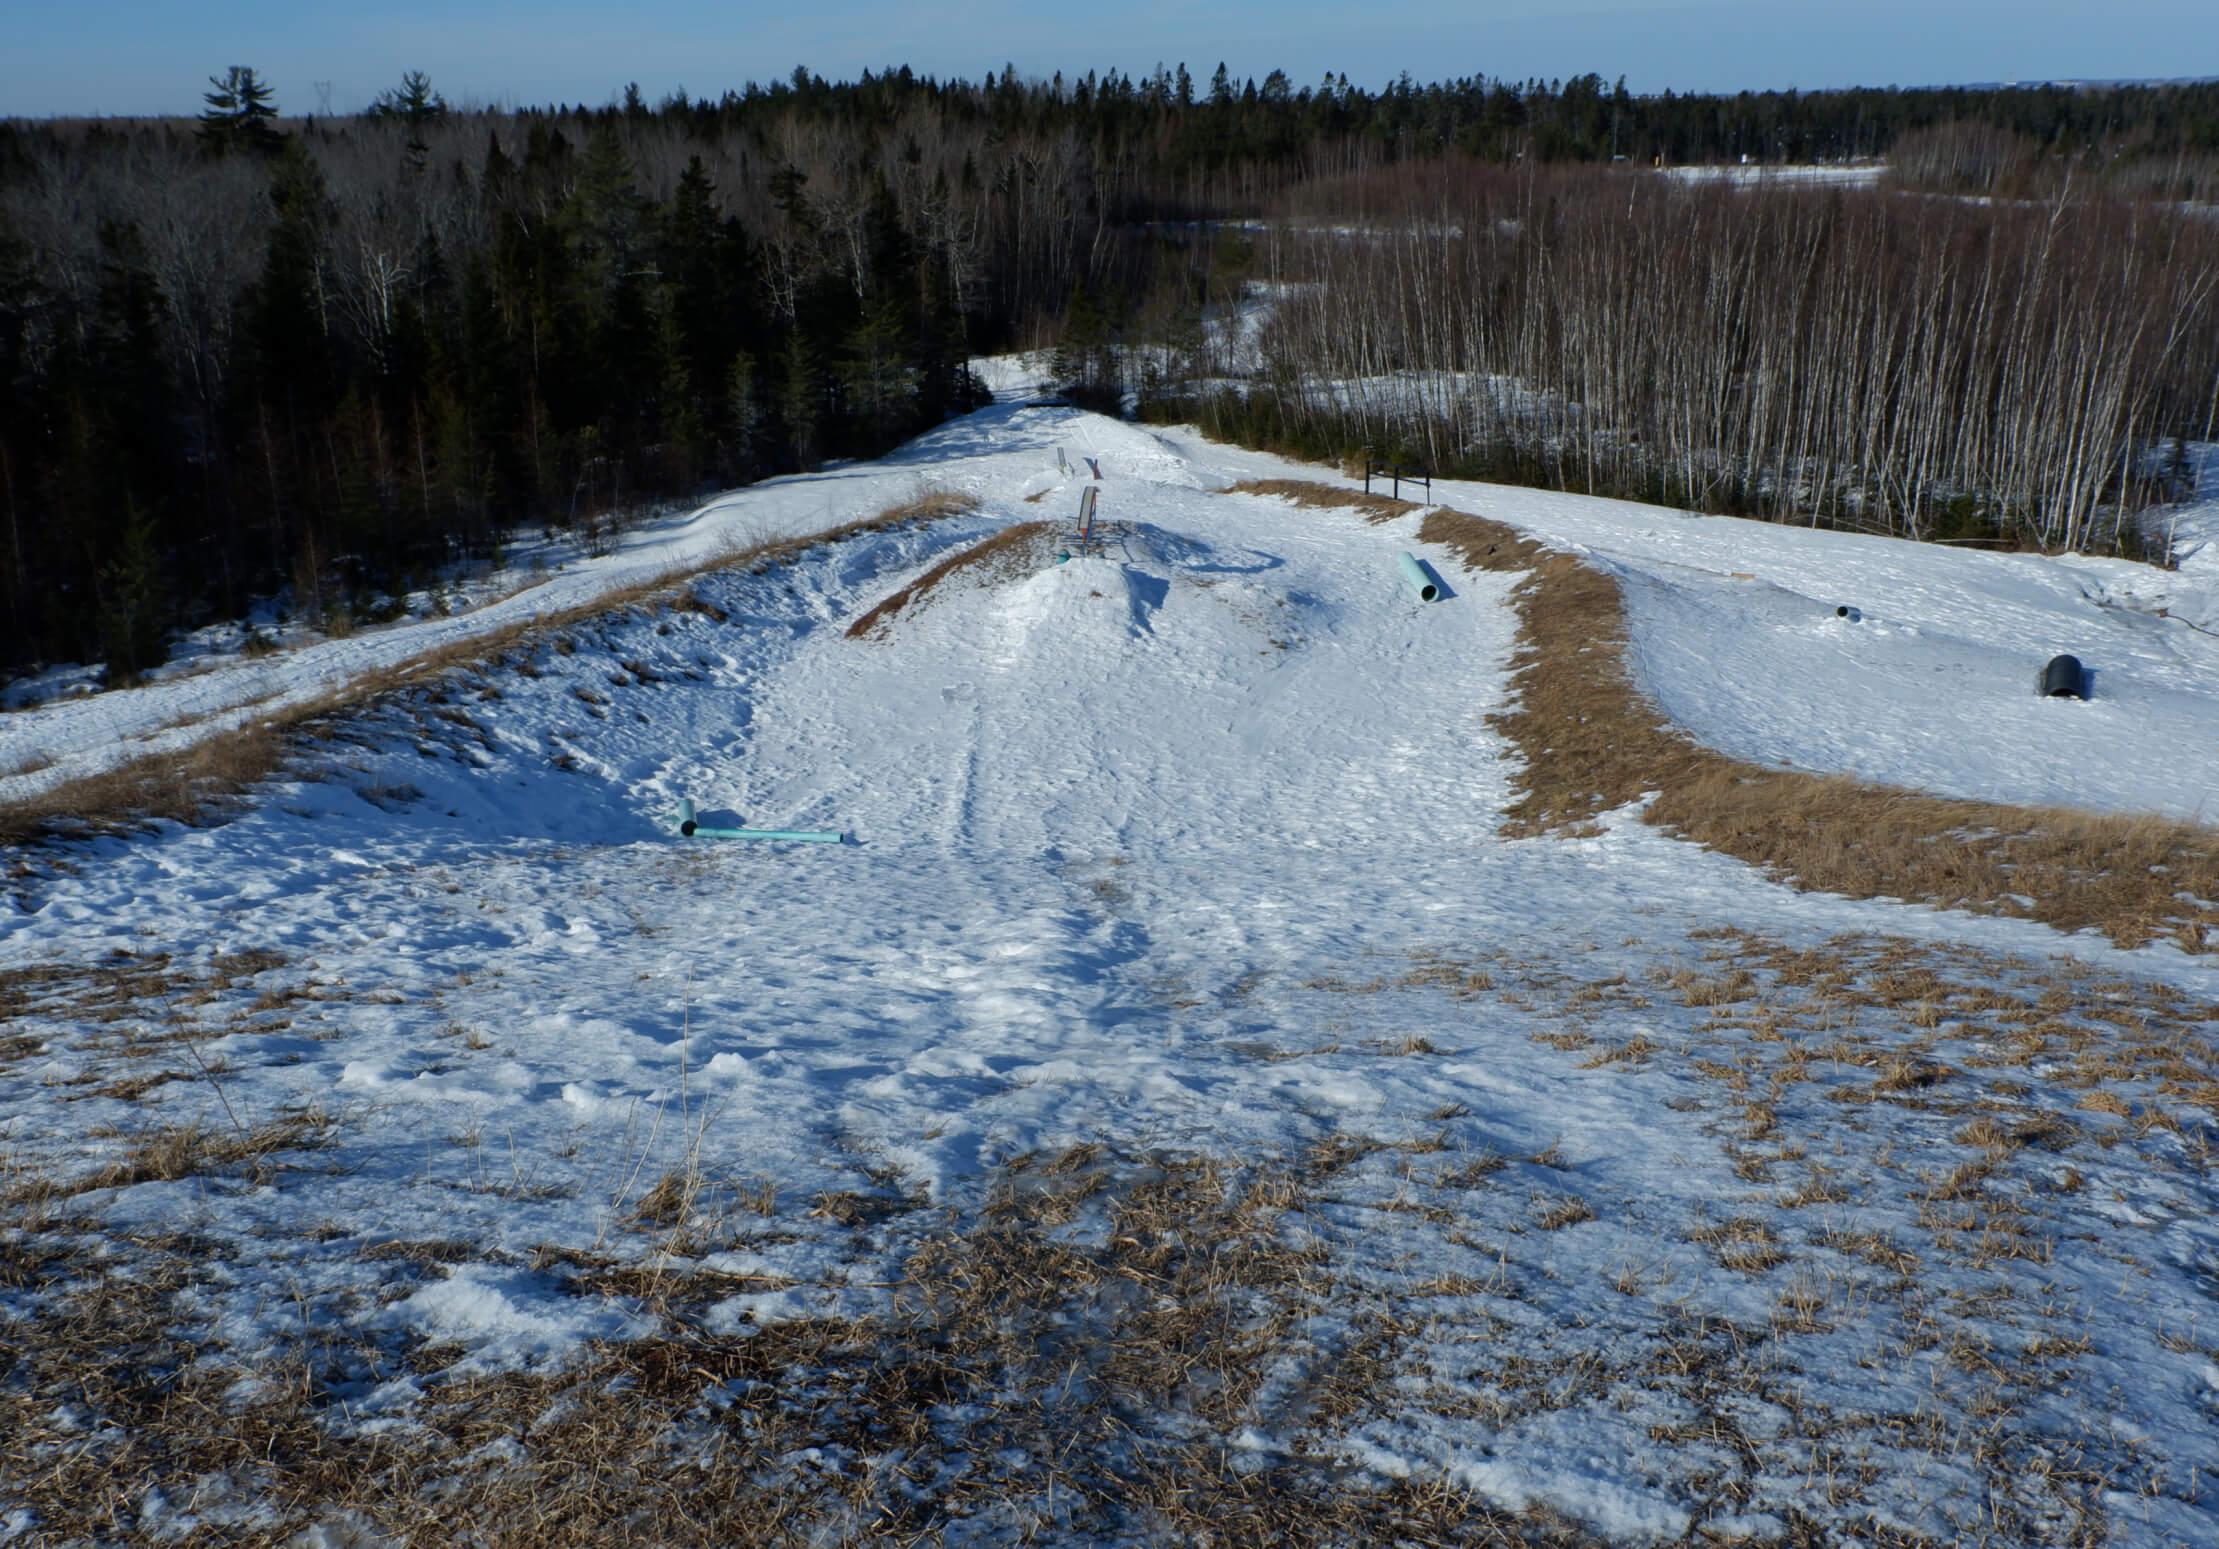 snowboarding riverview winter wonderland park pickle planet